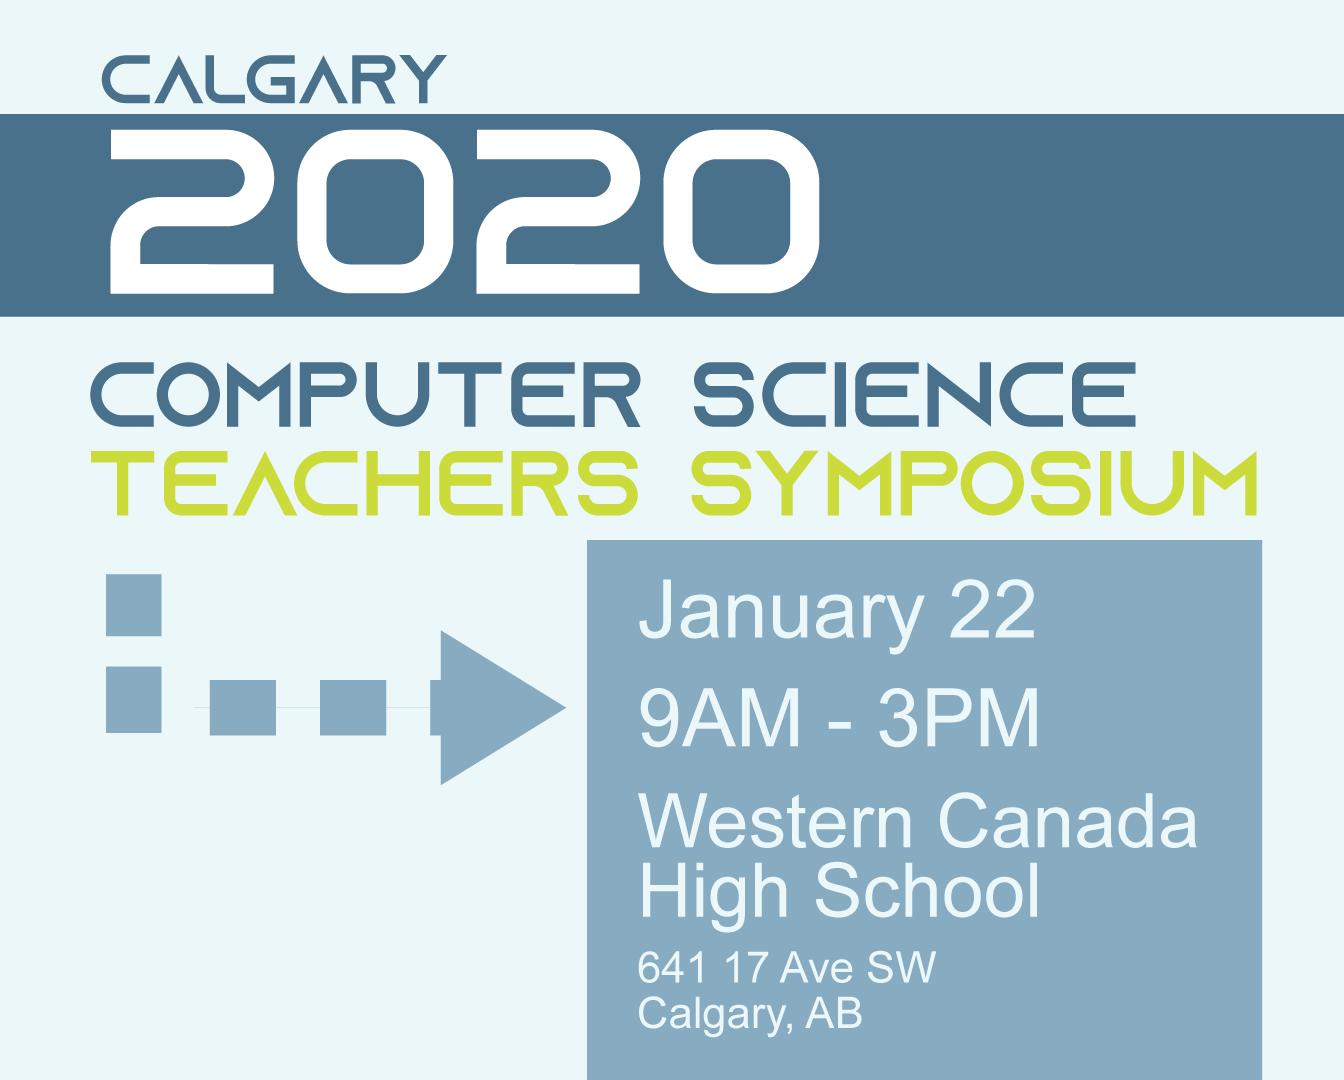 Southern Alberta 2020 CS Teachers' Symposium